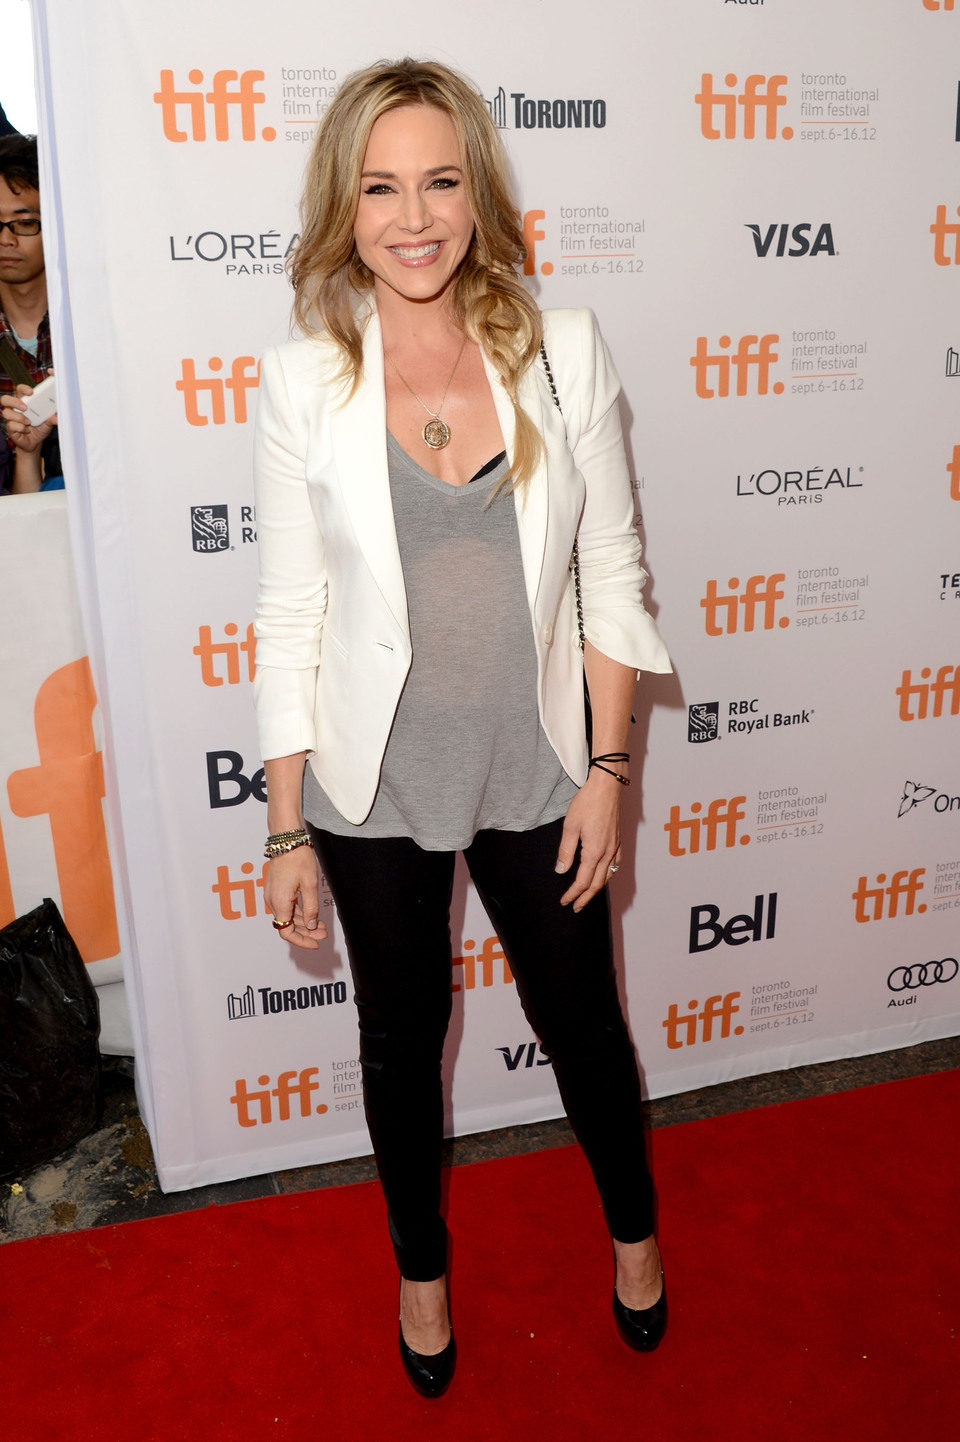 Julie Benz en el TIFF 2012